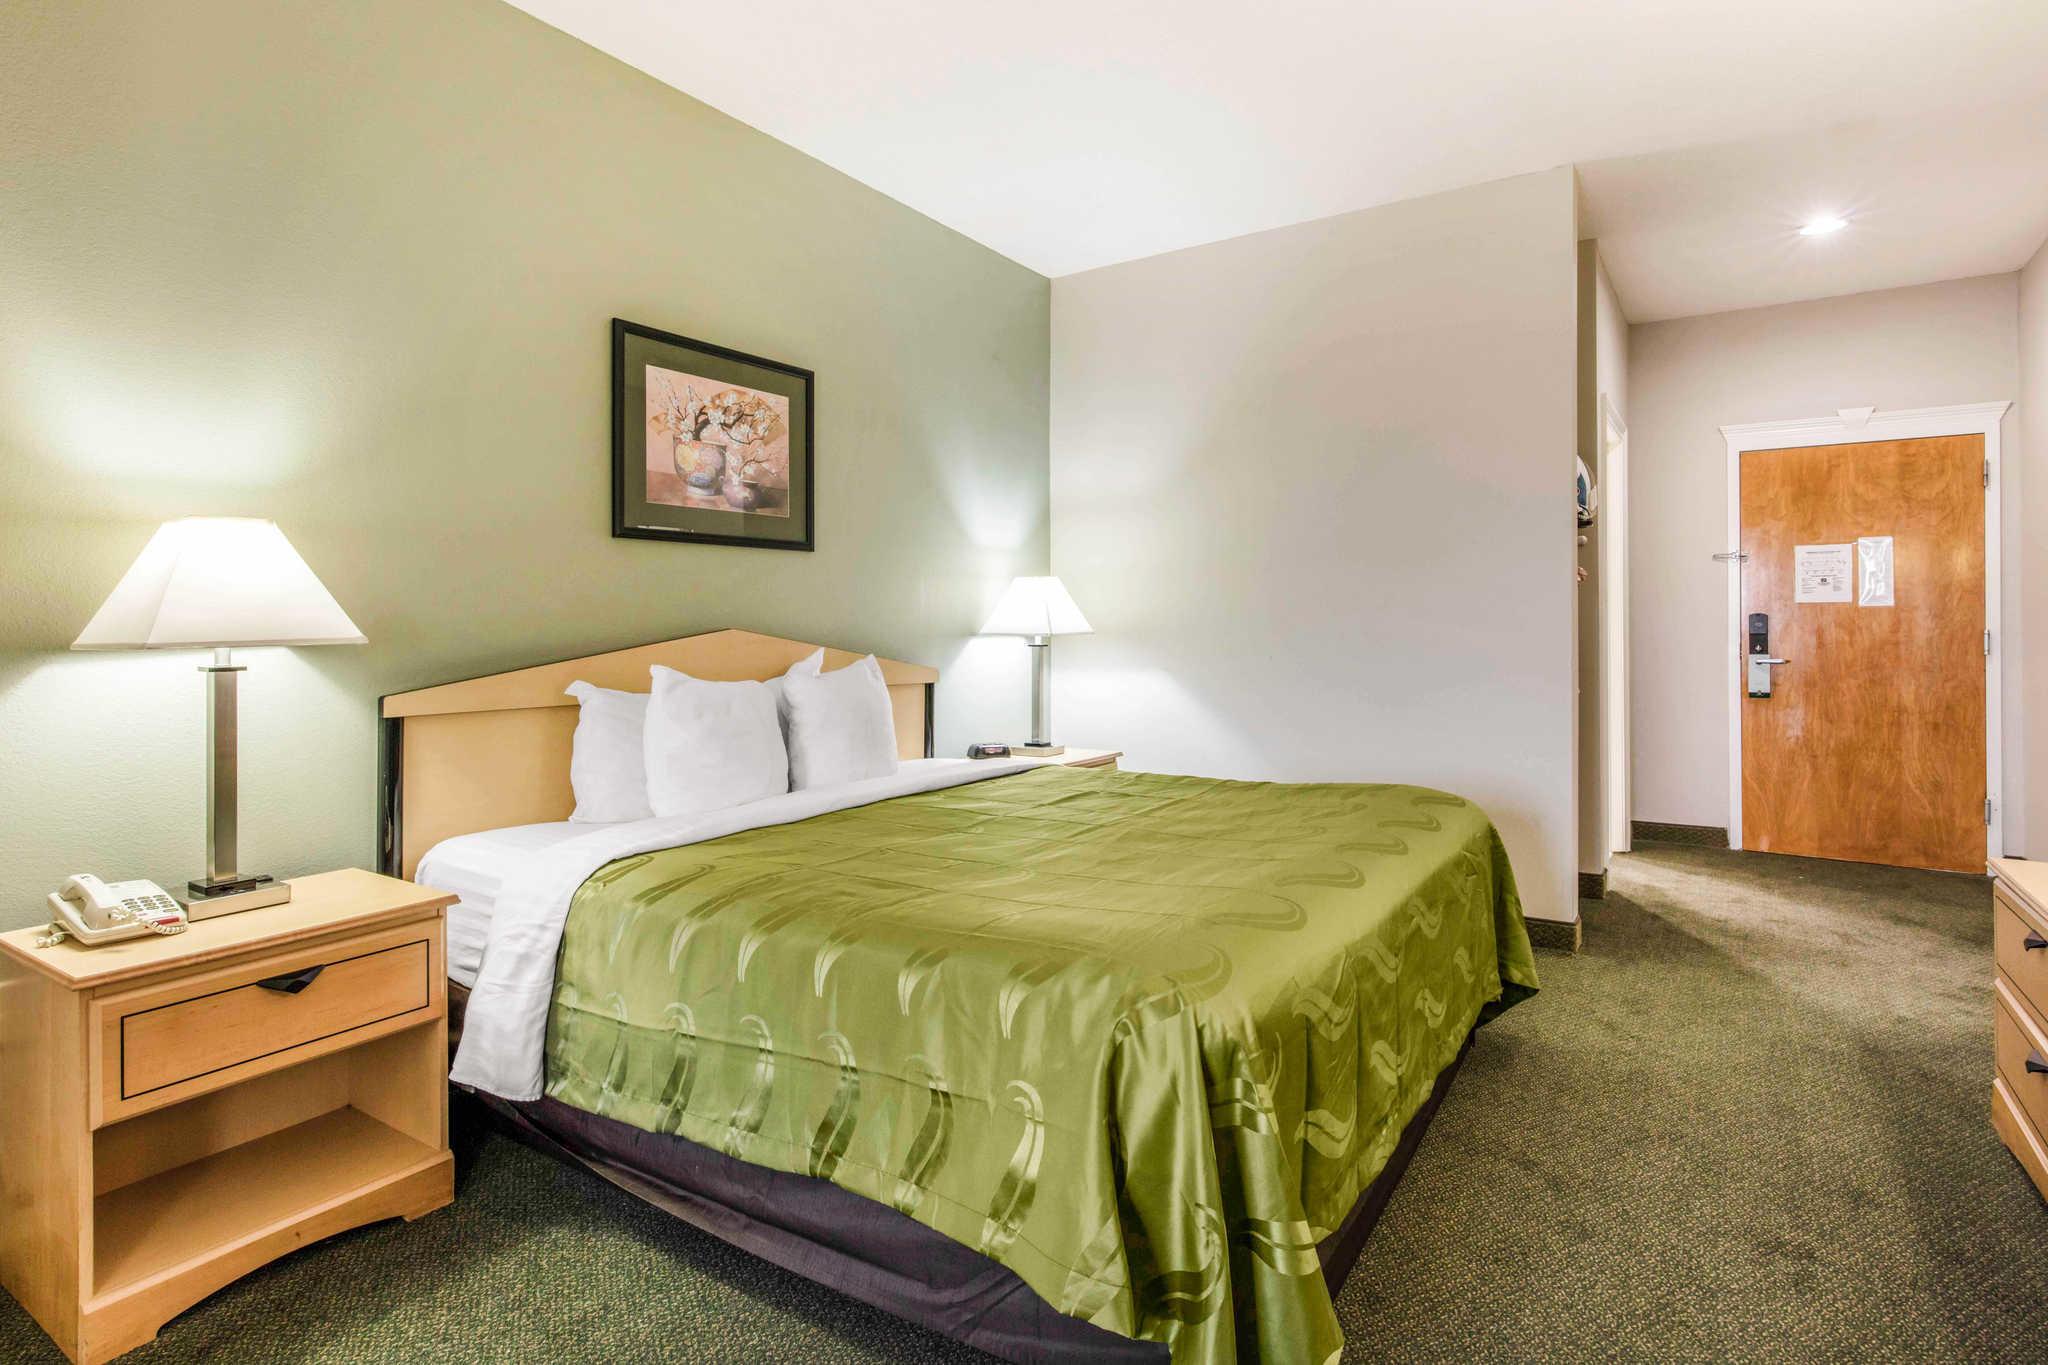 Quality Inn & Suites Jackson Int'l Airport image 17